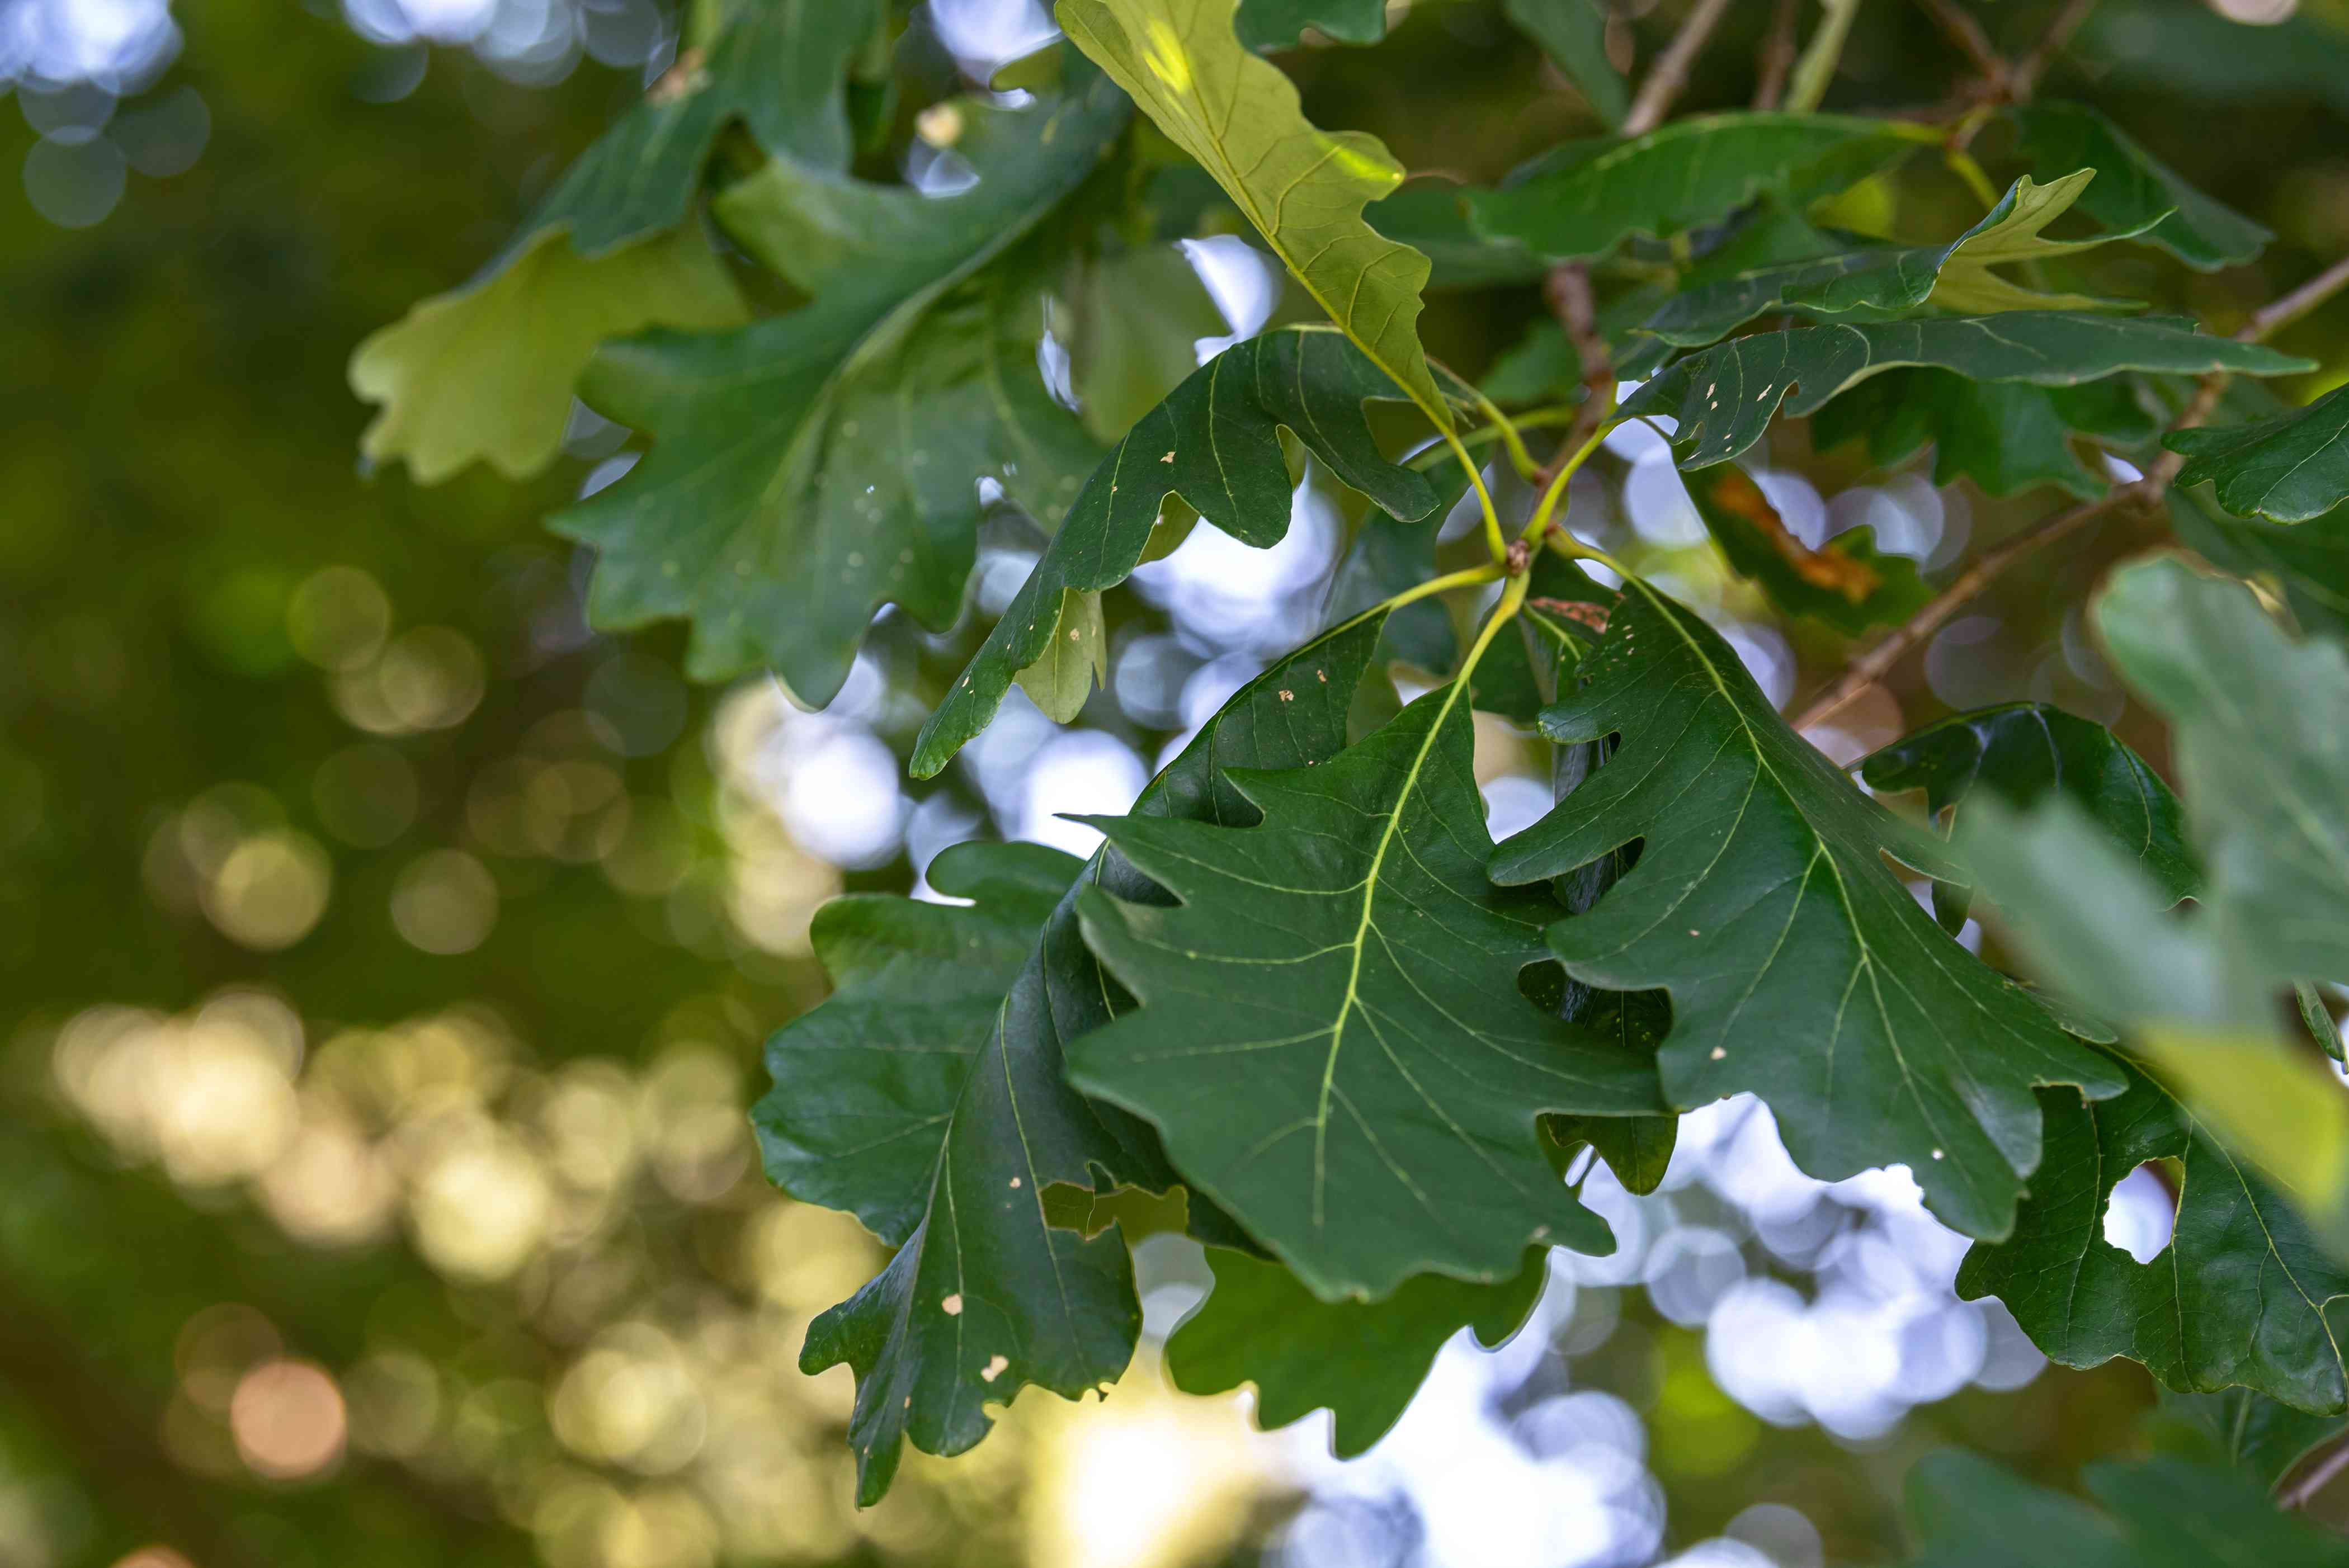 Bur oak tree branch with dark green wavy-edged leaves hanging closeup